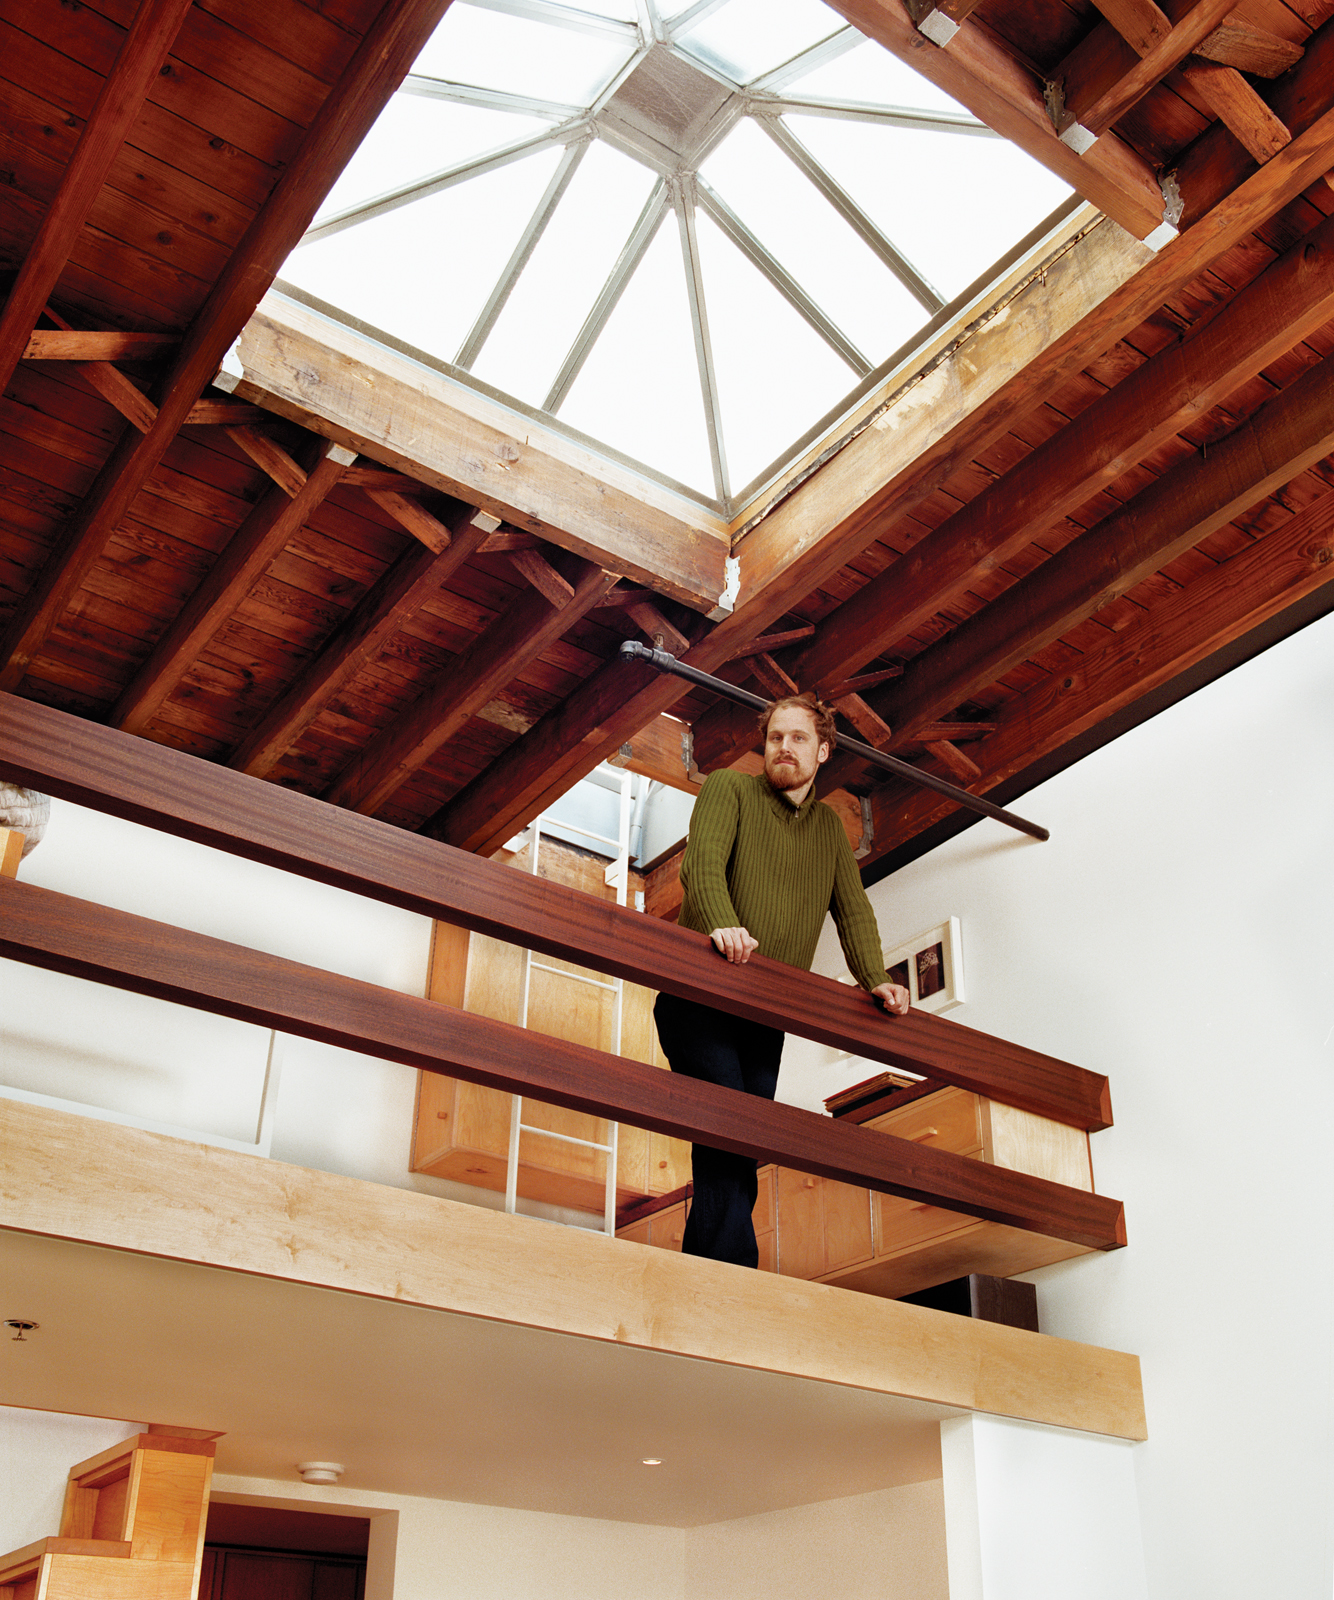 Upstairs sleeping loft with mahogany rails